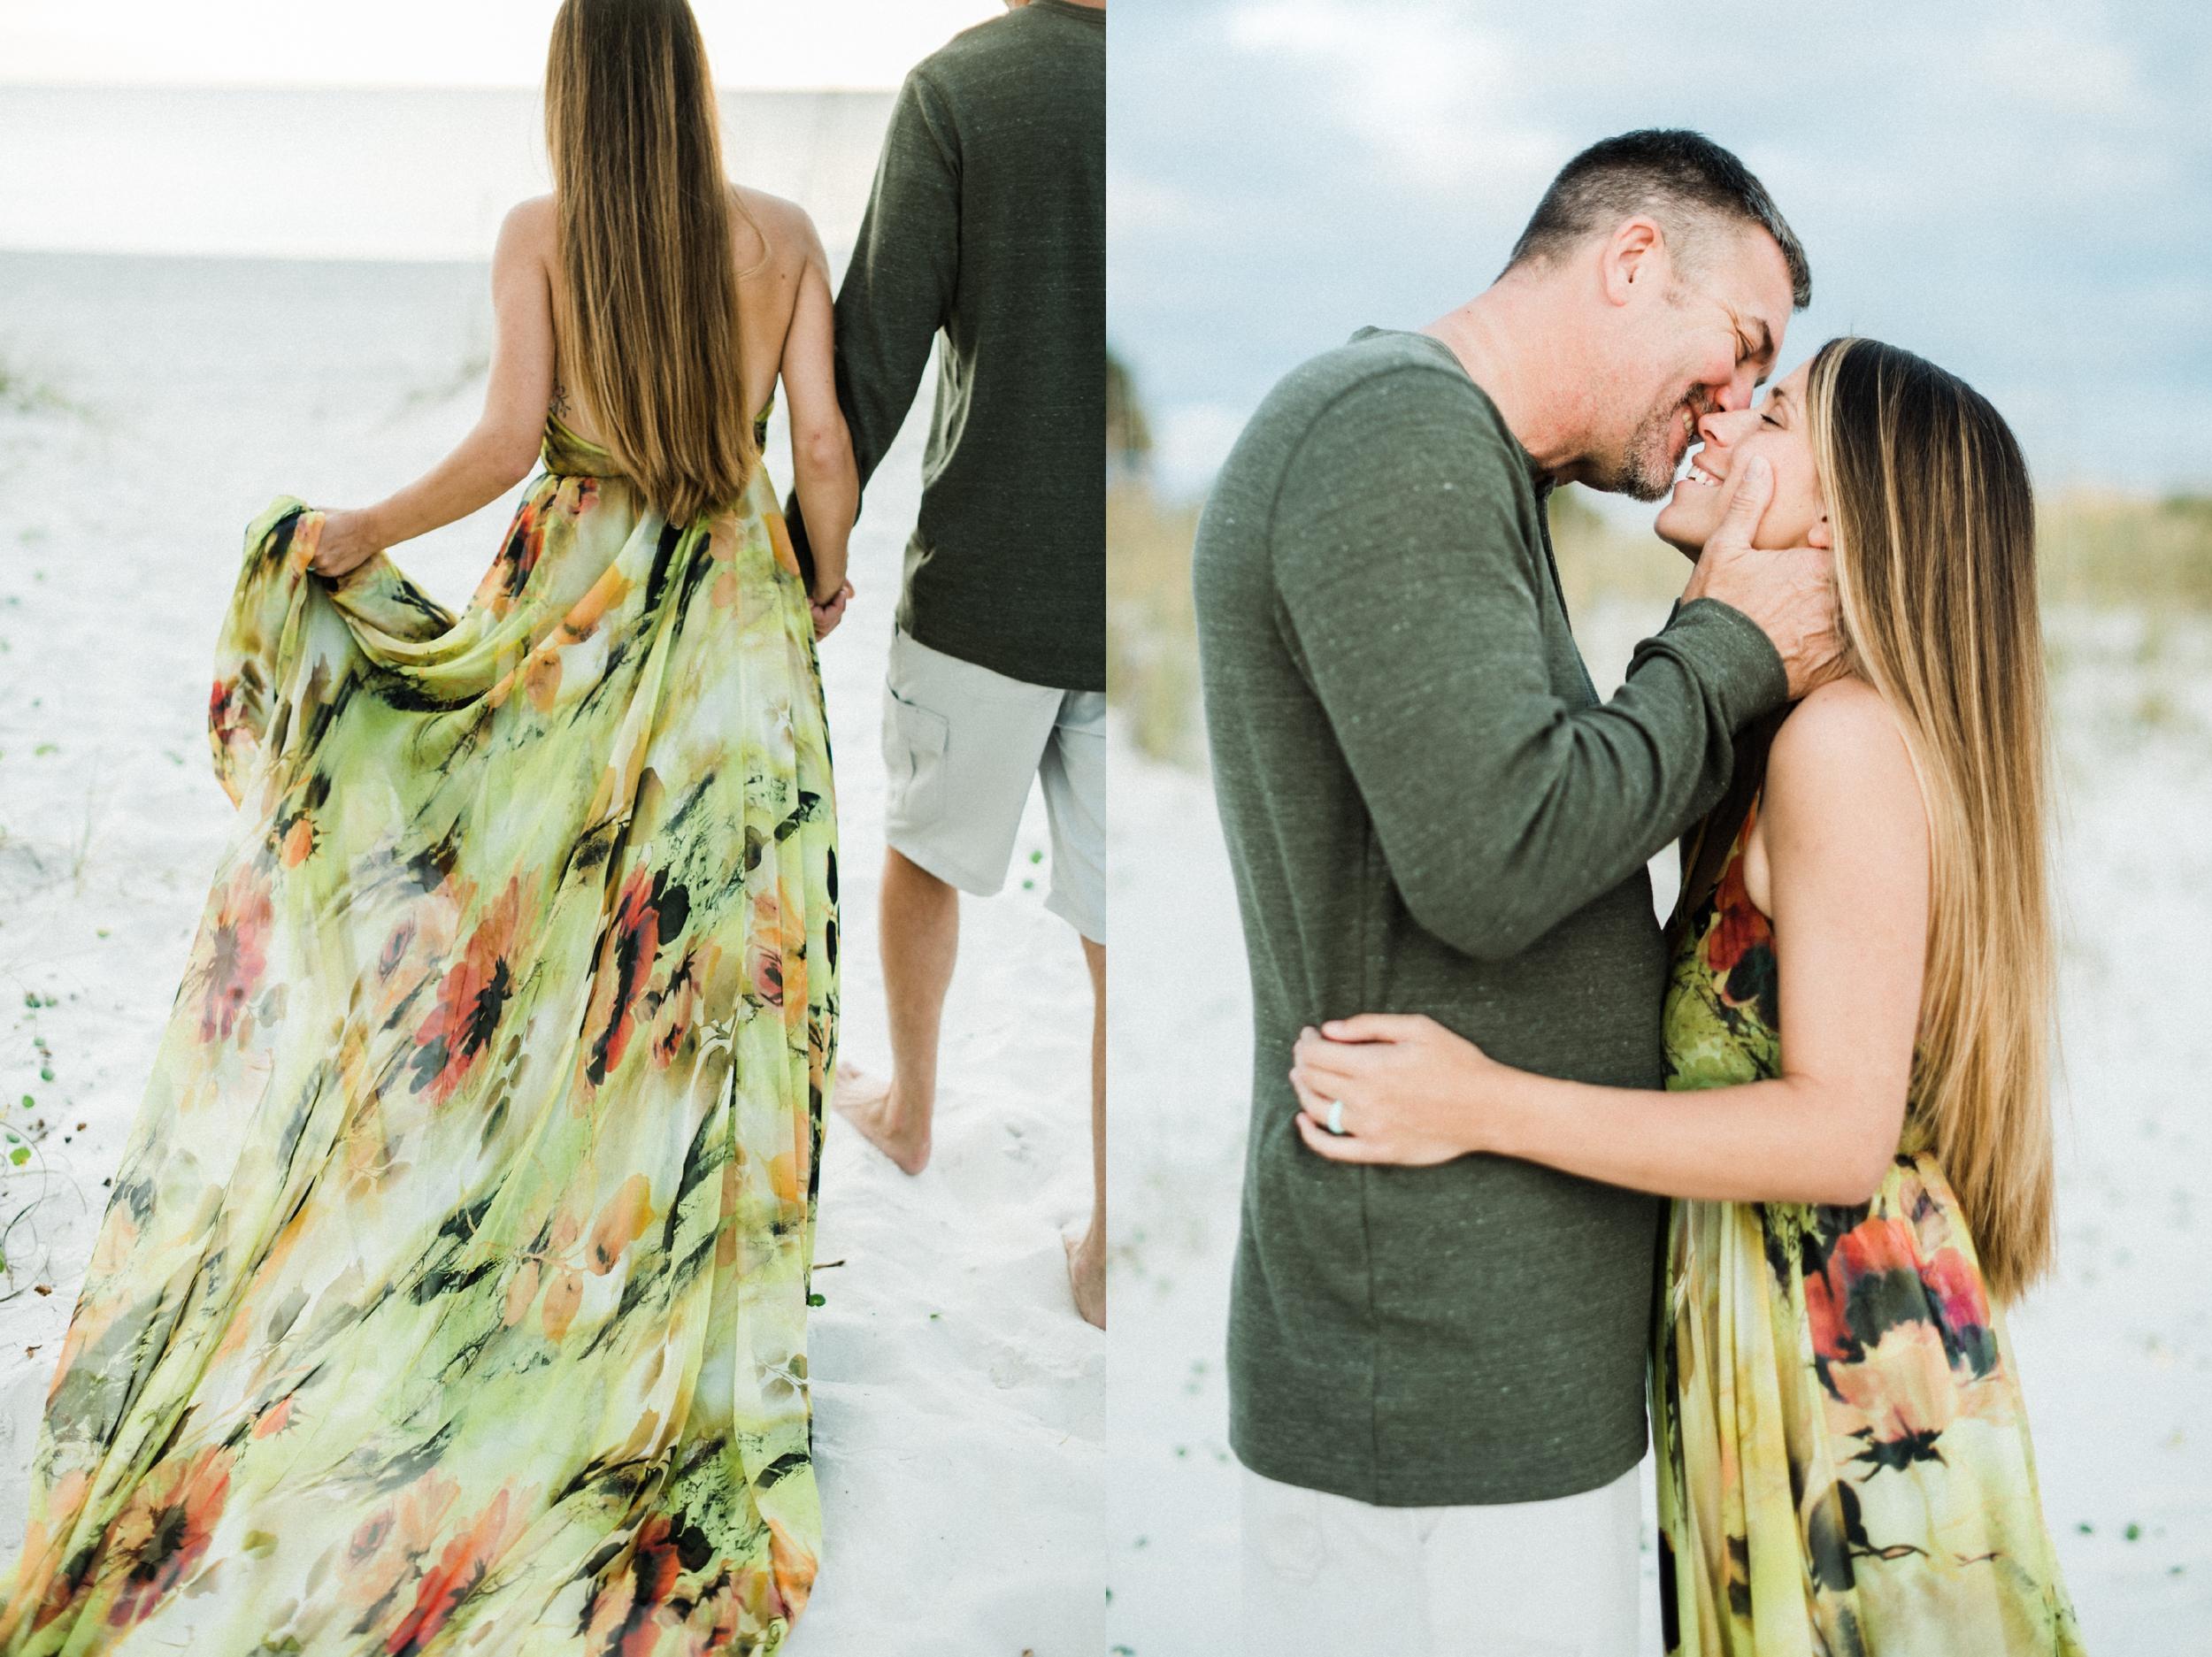 desiree-gardner-photography-pairs-france-monet-garden-monets-couple-wedding-engagement-giverny-30-a-30a-florida_0070.jpg